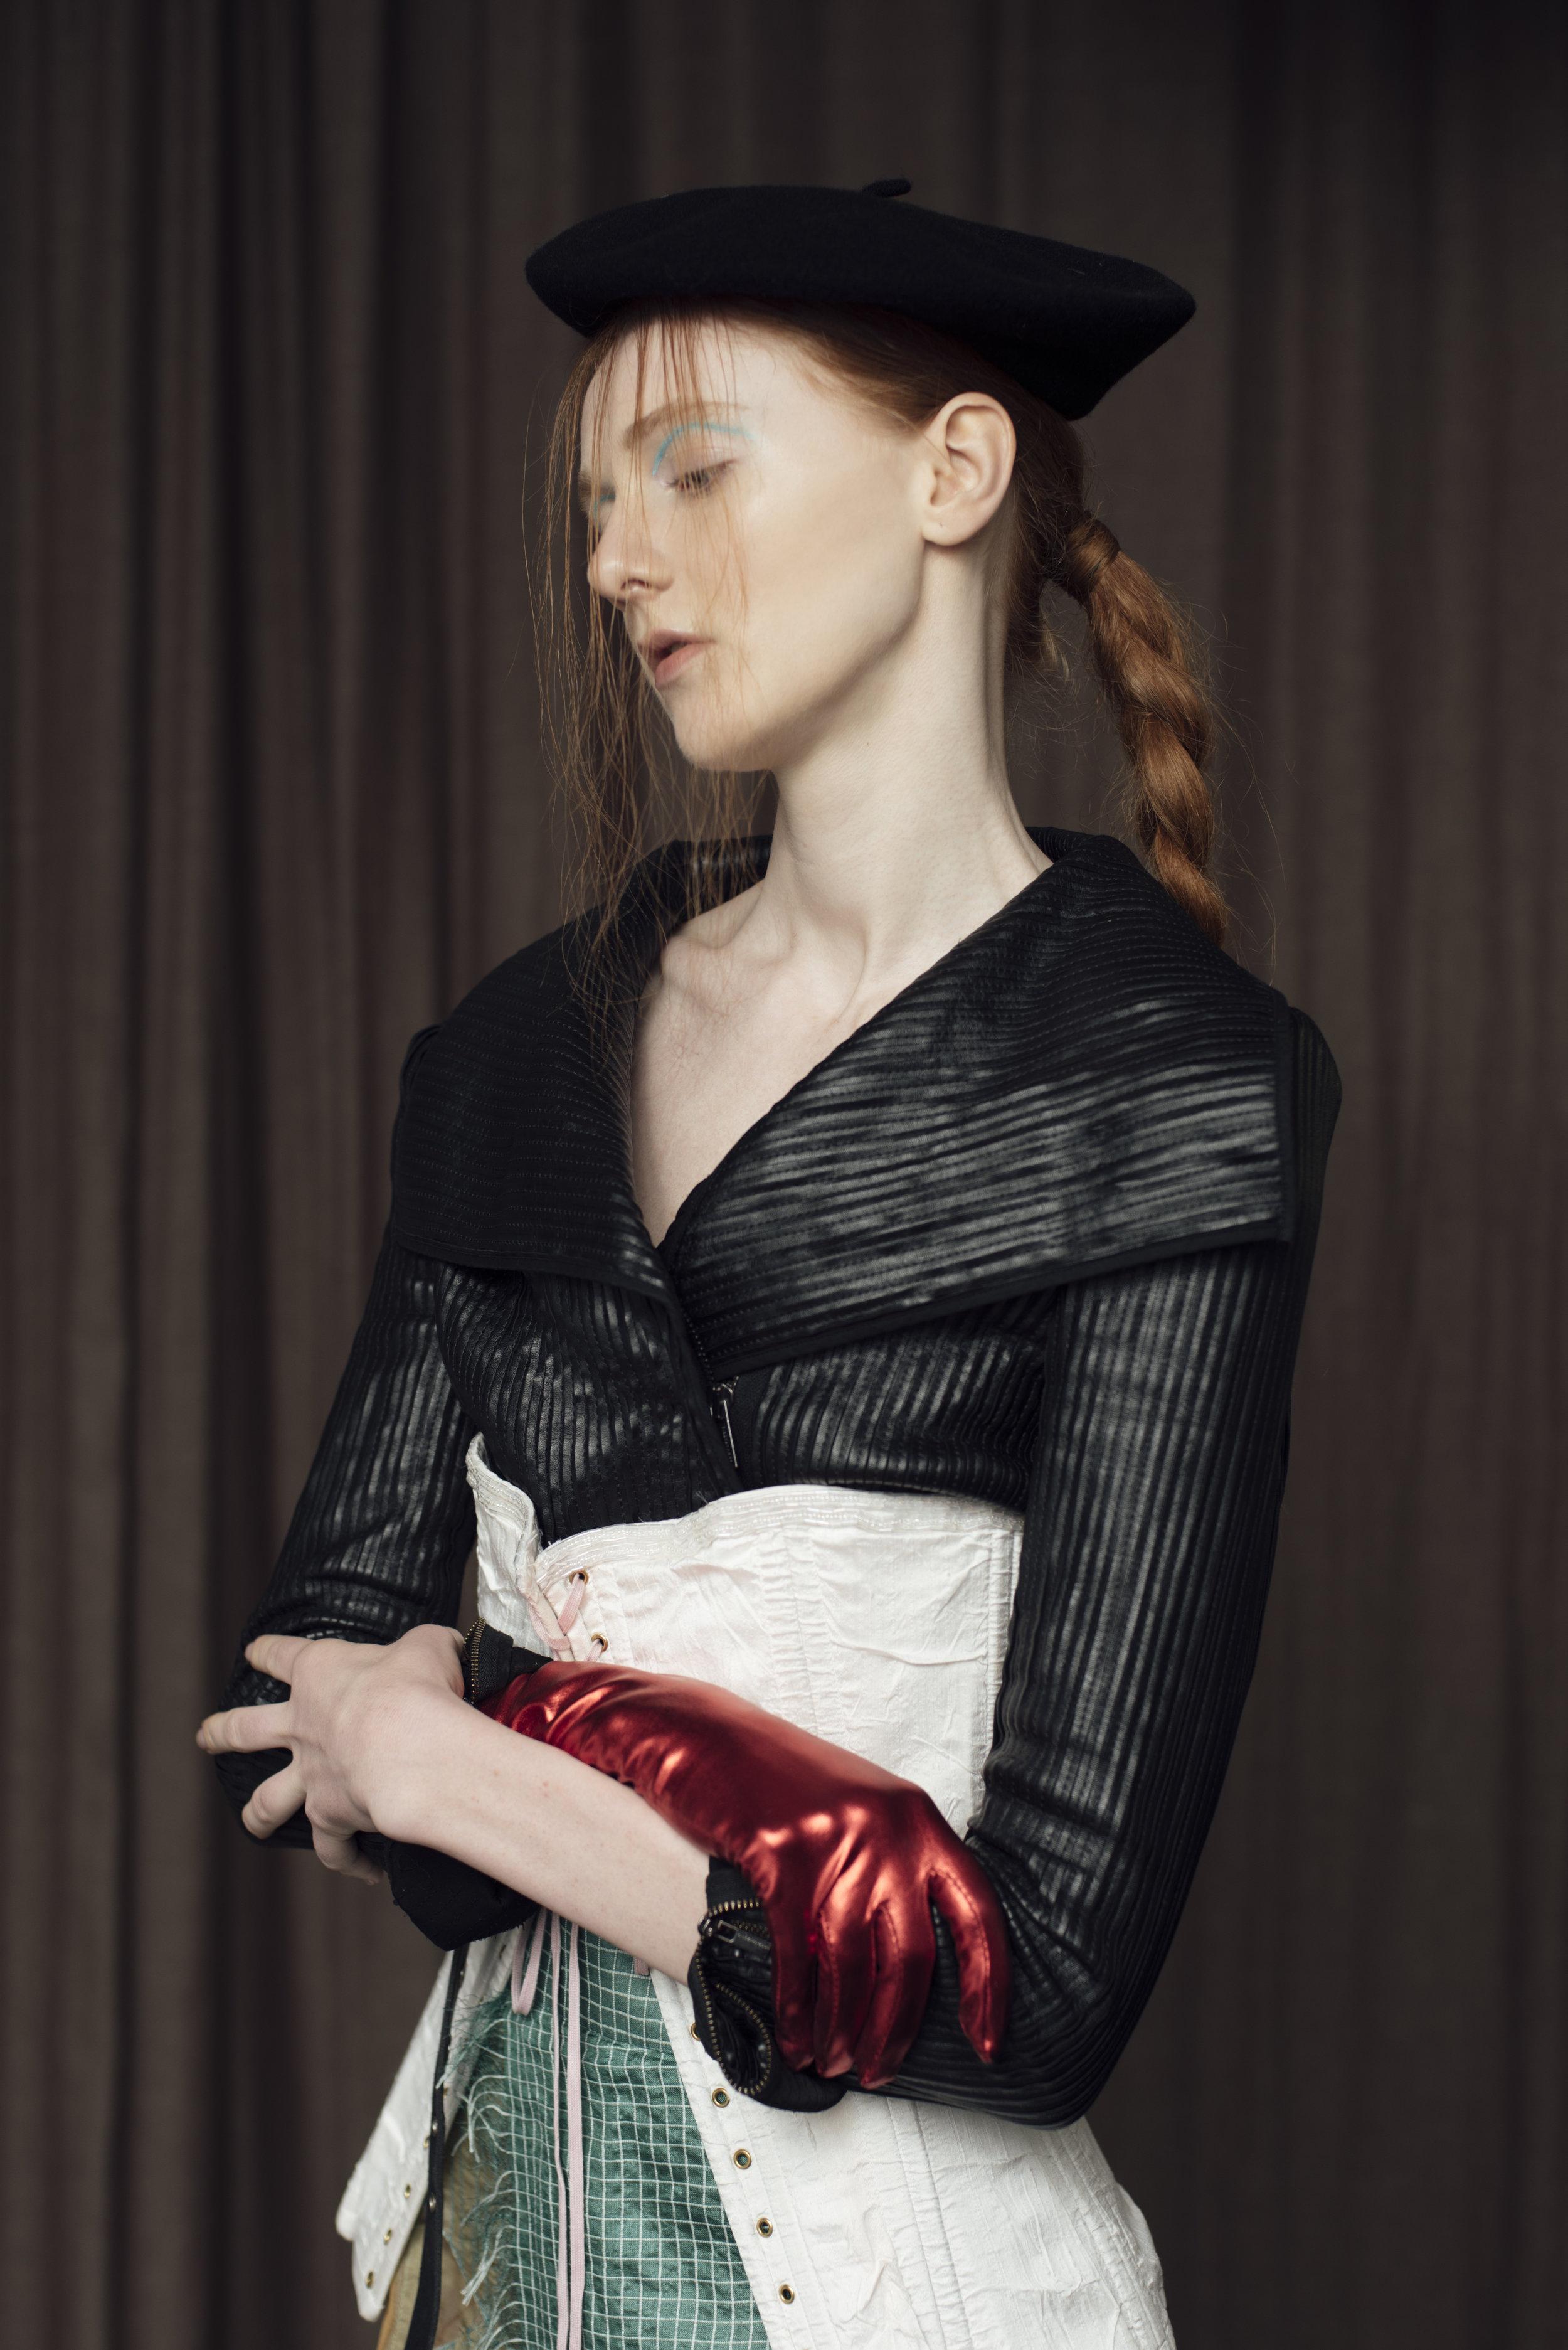 Jacket  BCBG ,corset COSTUME STUDIO, trousers  CONSTANCE BLACKBALLER ,glove STYLIST'S OWN,beret  BEYOND RETRO